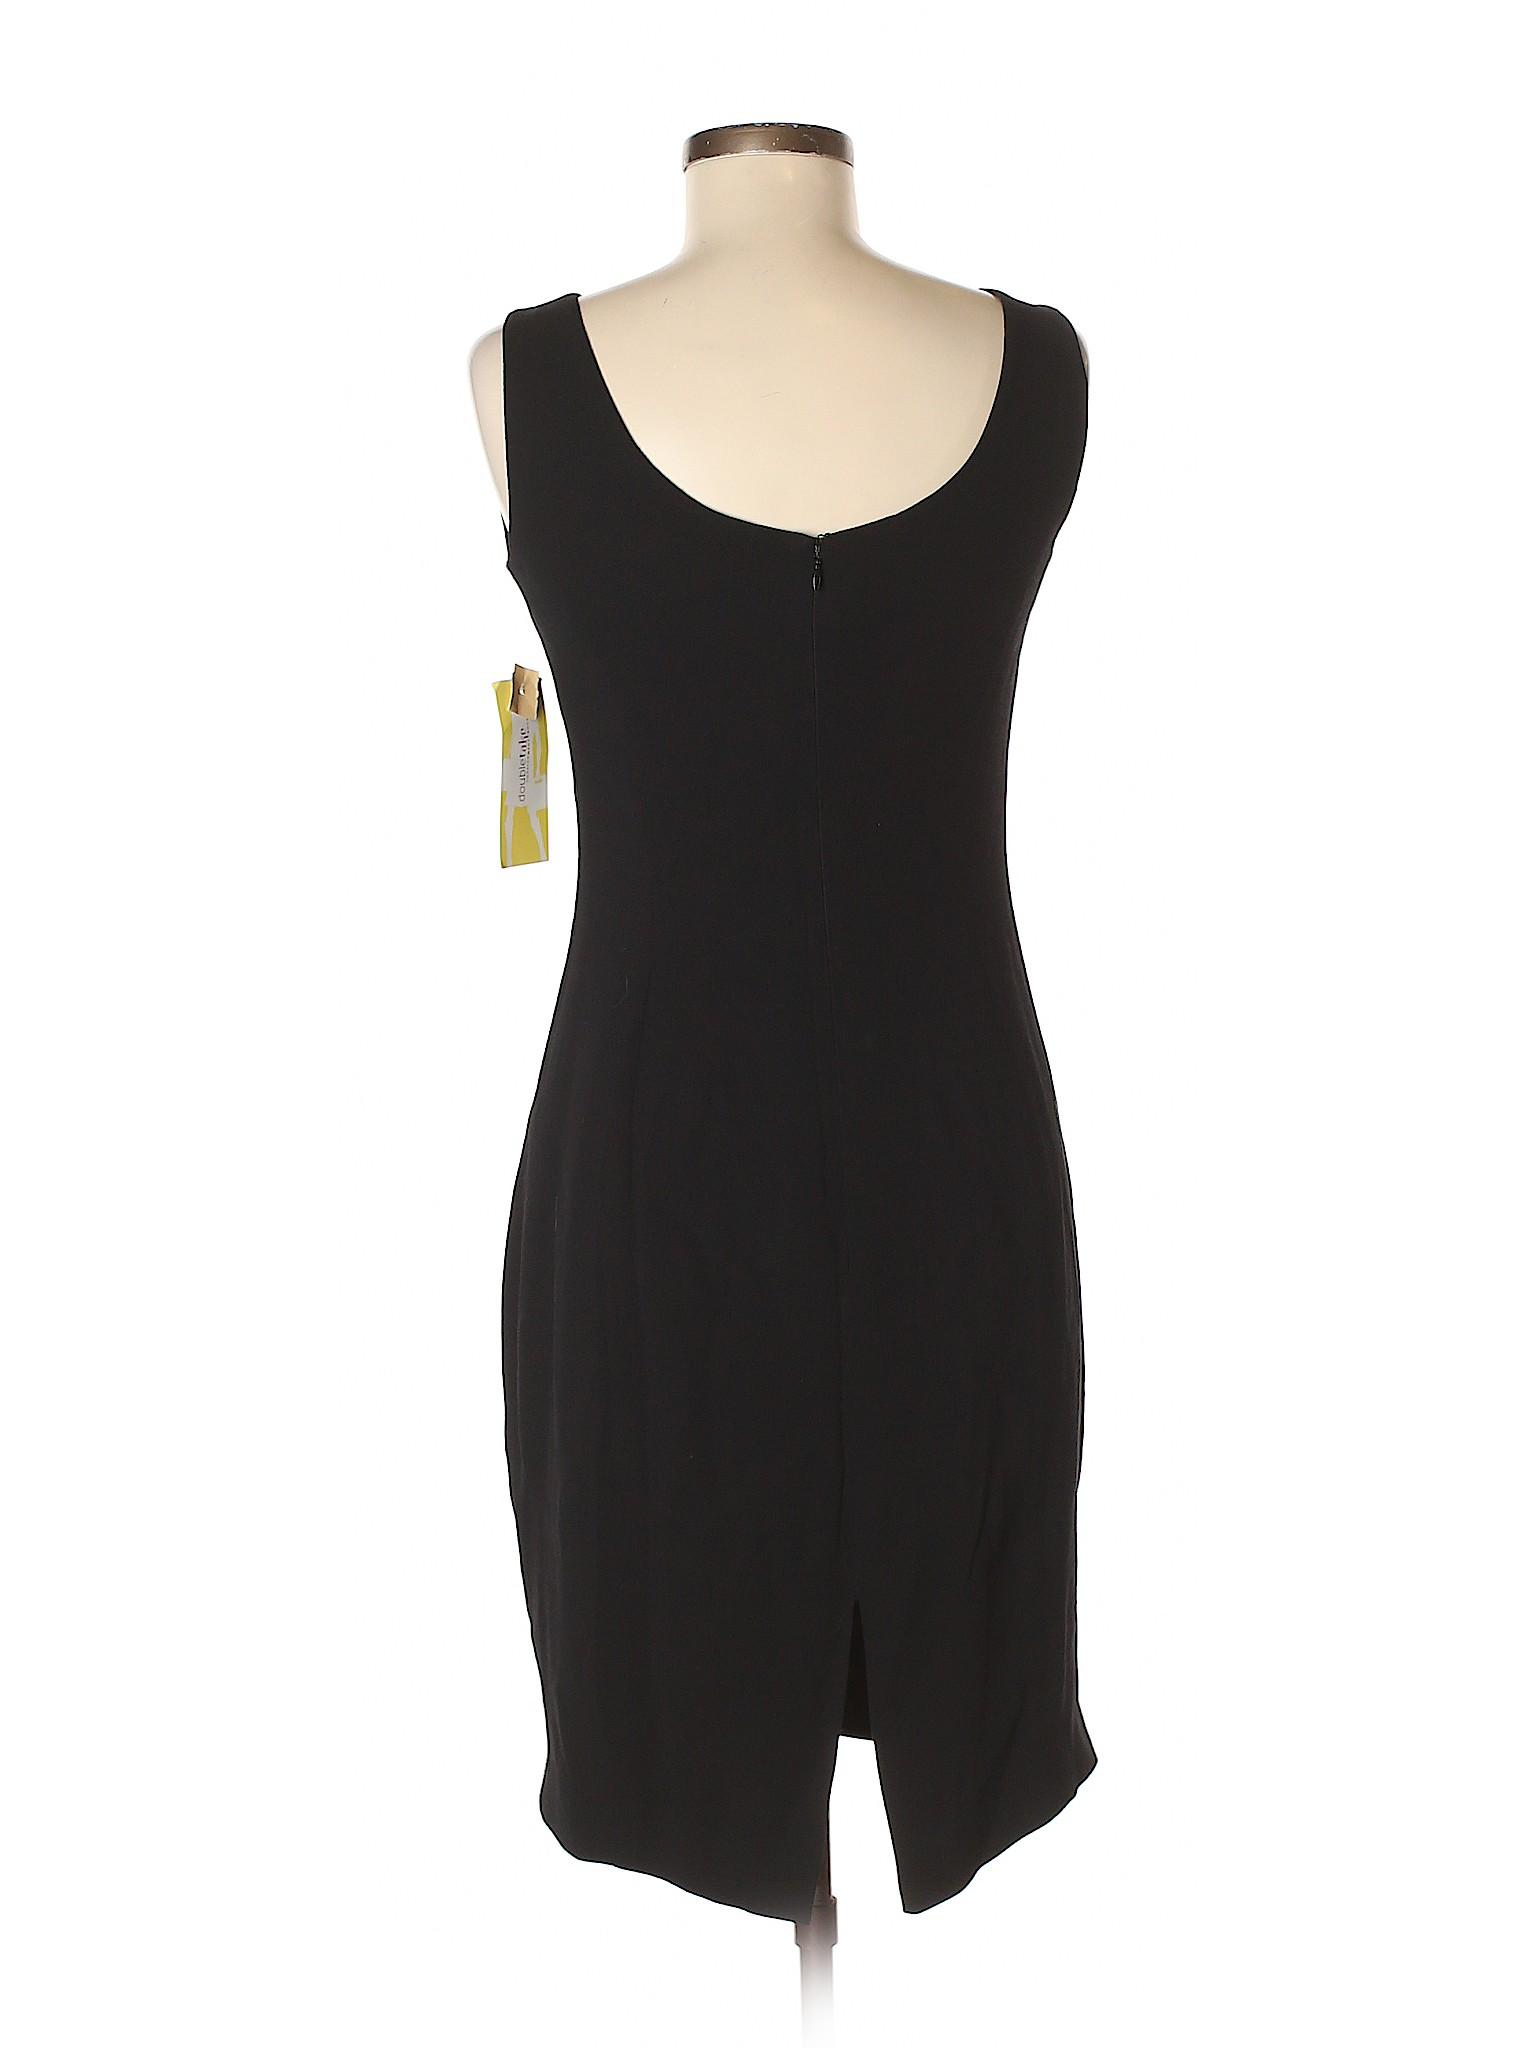 Boutique Isaac Casual Mizrahi Dress winter FFxgP